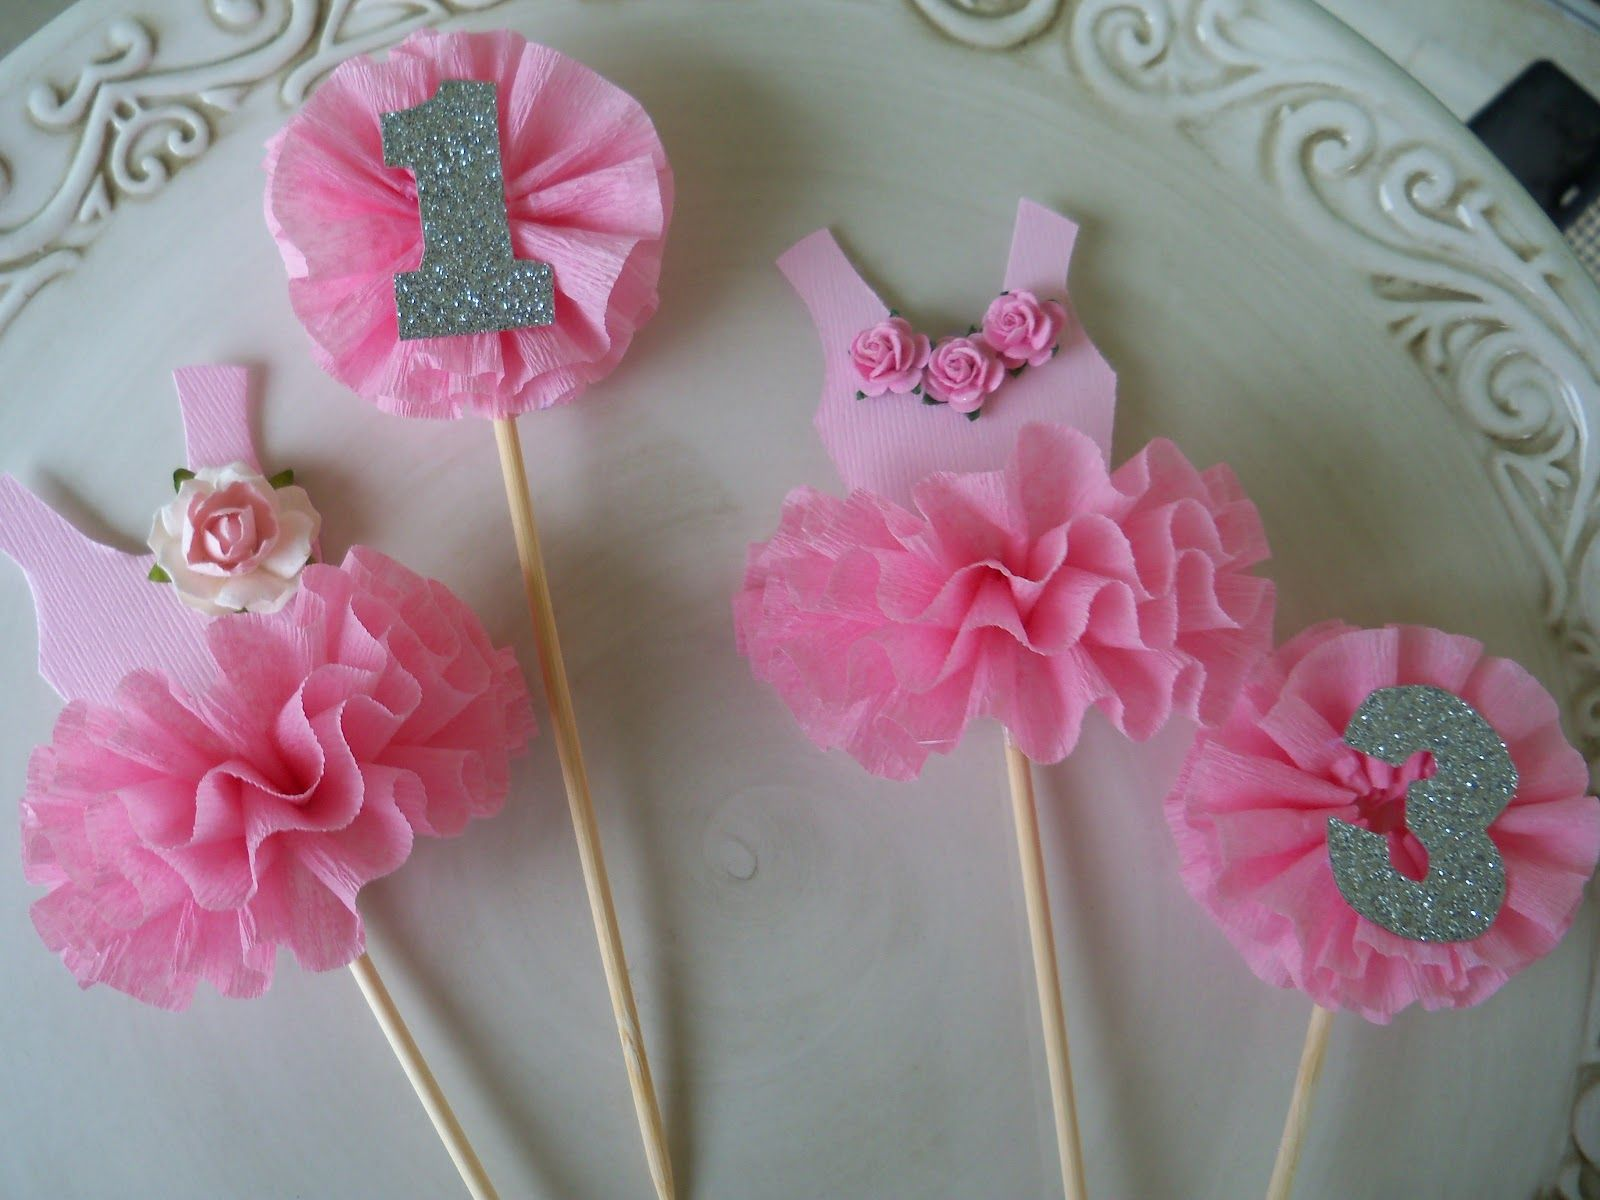 pin the tutu on the ballerina template - tutu template craft ballet tutu cake toppers first